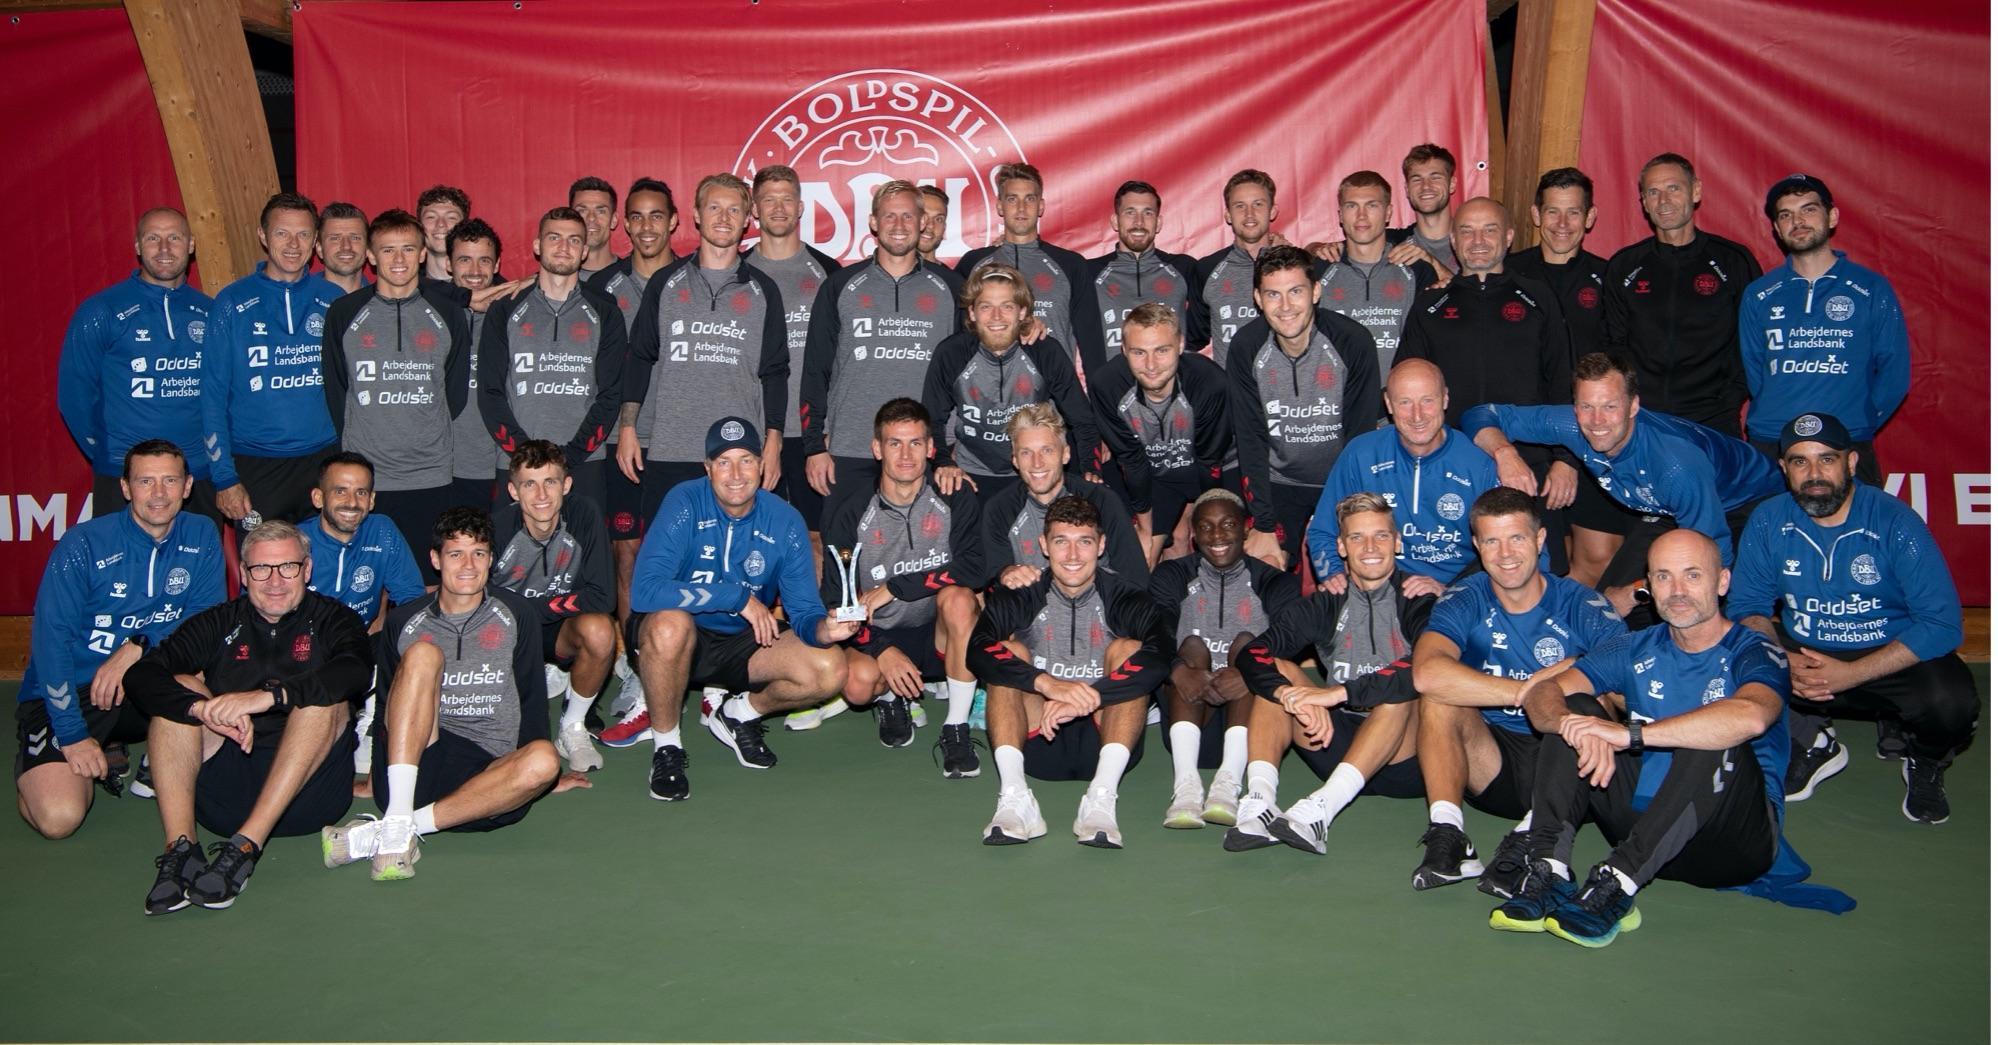 Die dänische Fußball-Nationalmannschaft erhält den Sport Bild-Award